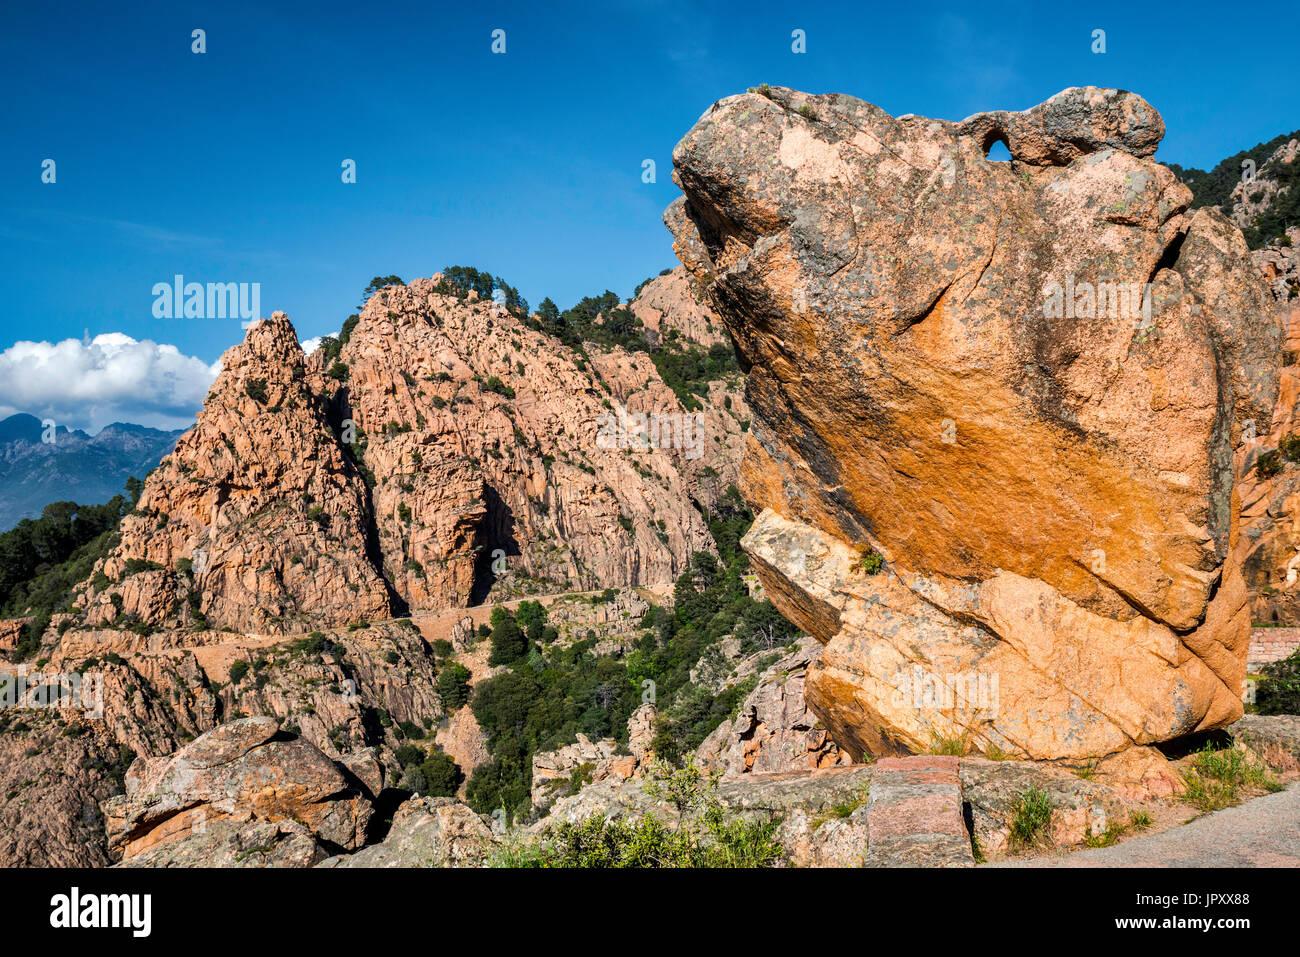 Orange ist Granitfelsen, in Les Calanches de Piana, UNESCO-Weltkulturerbe, Corse-du-Sud, Korsika, Frankreich Stockbild